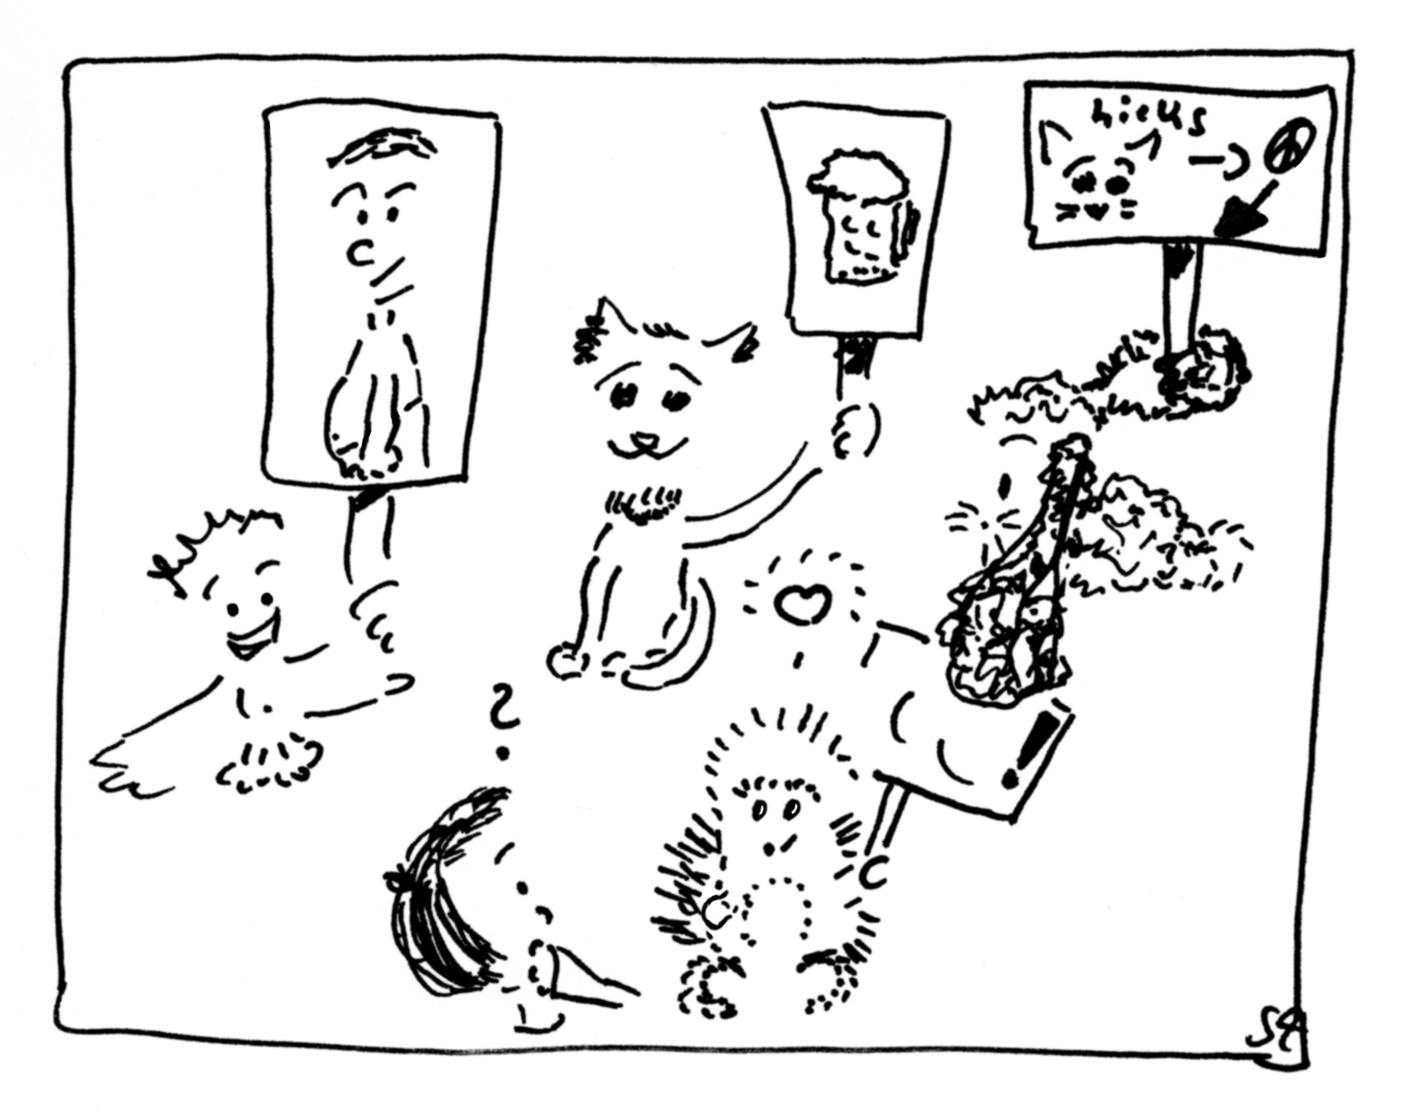 comicfigurenfürkassierer